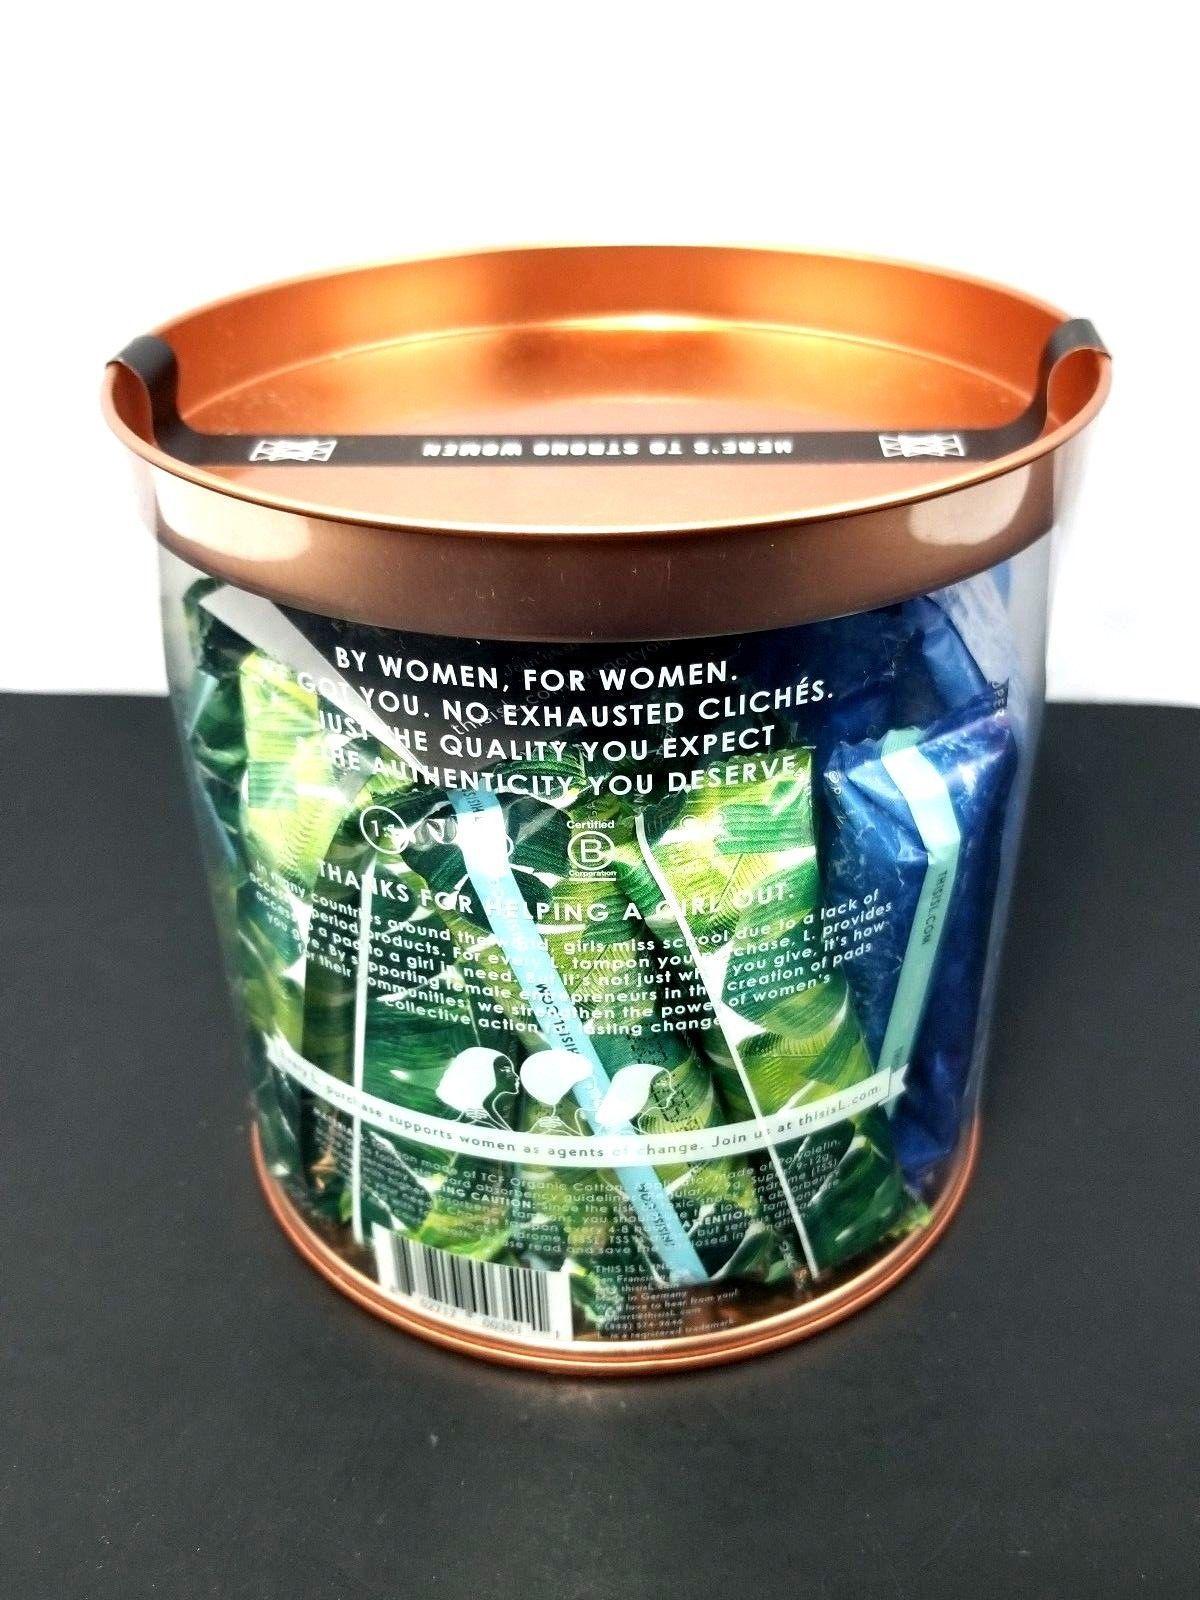 L Organic Cotton Tampons with Sleek Plastic Applicators Regular + Super New